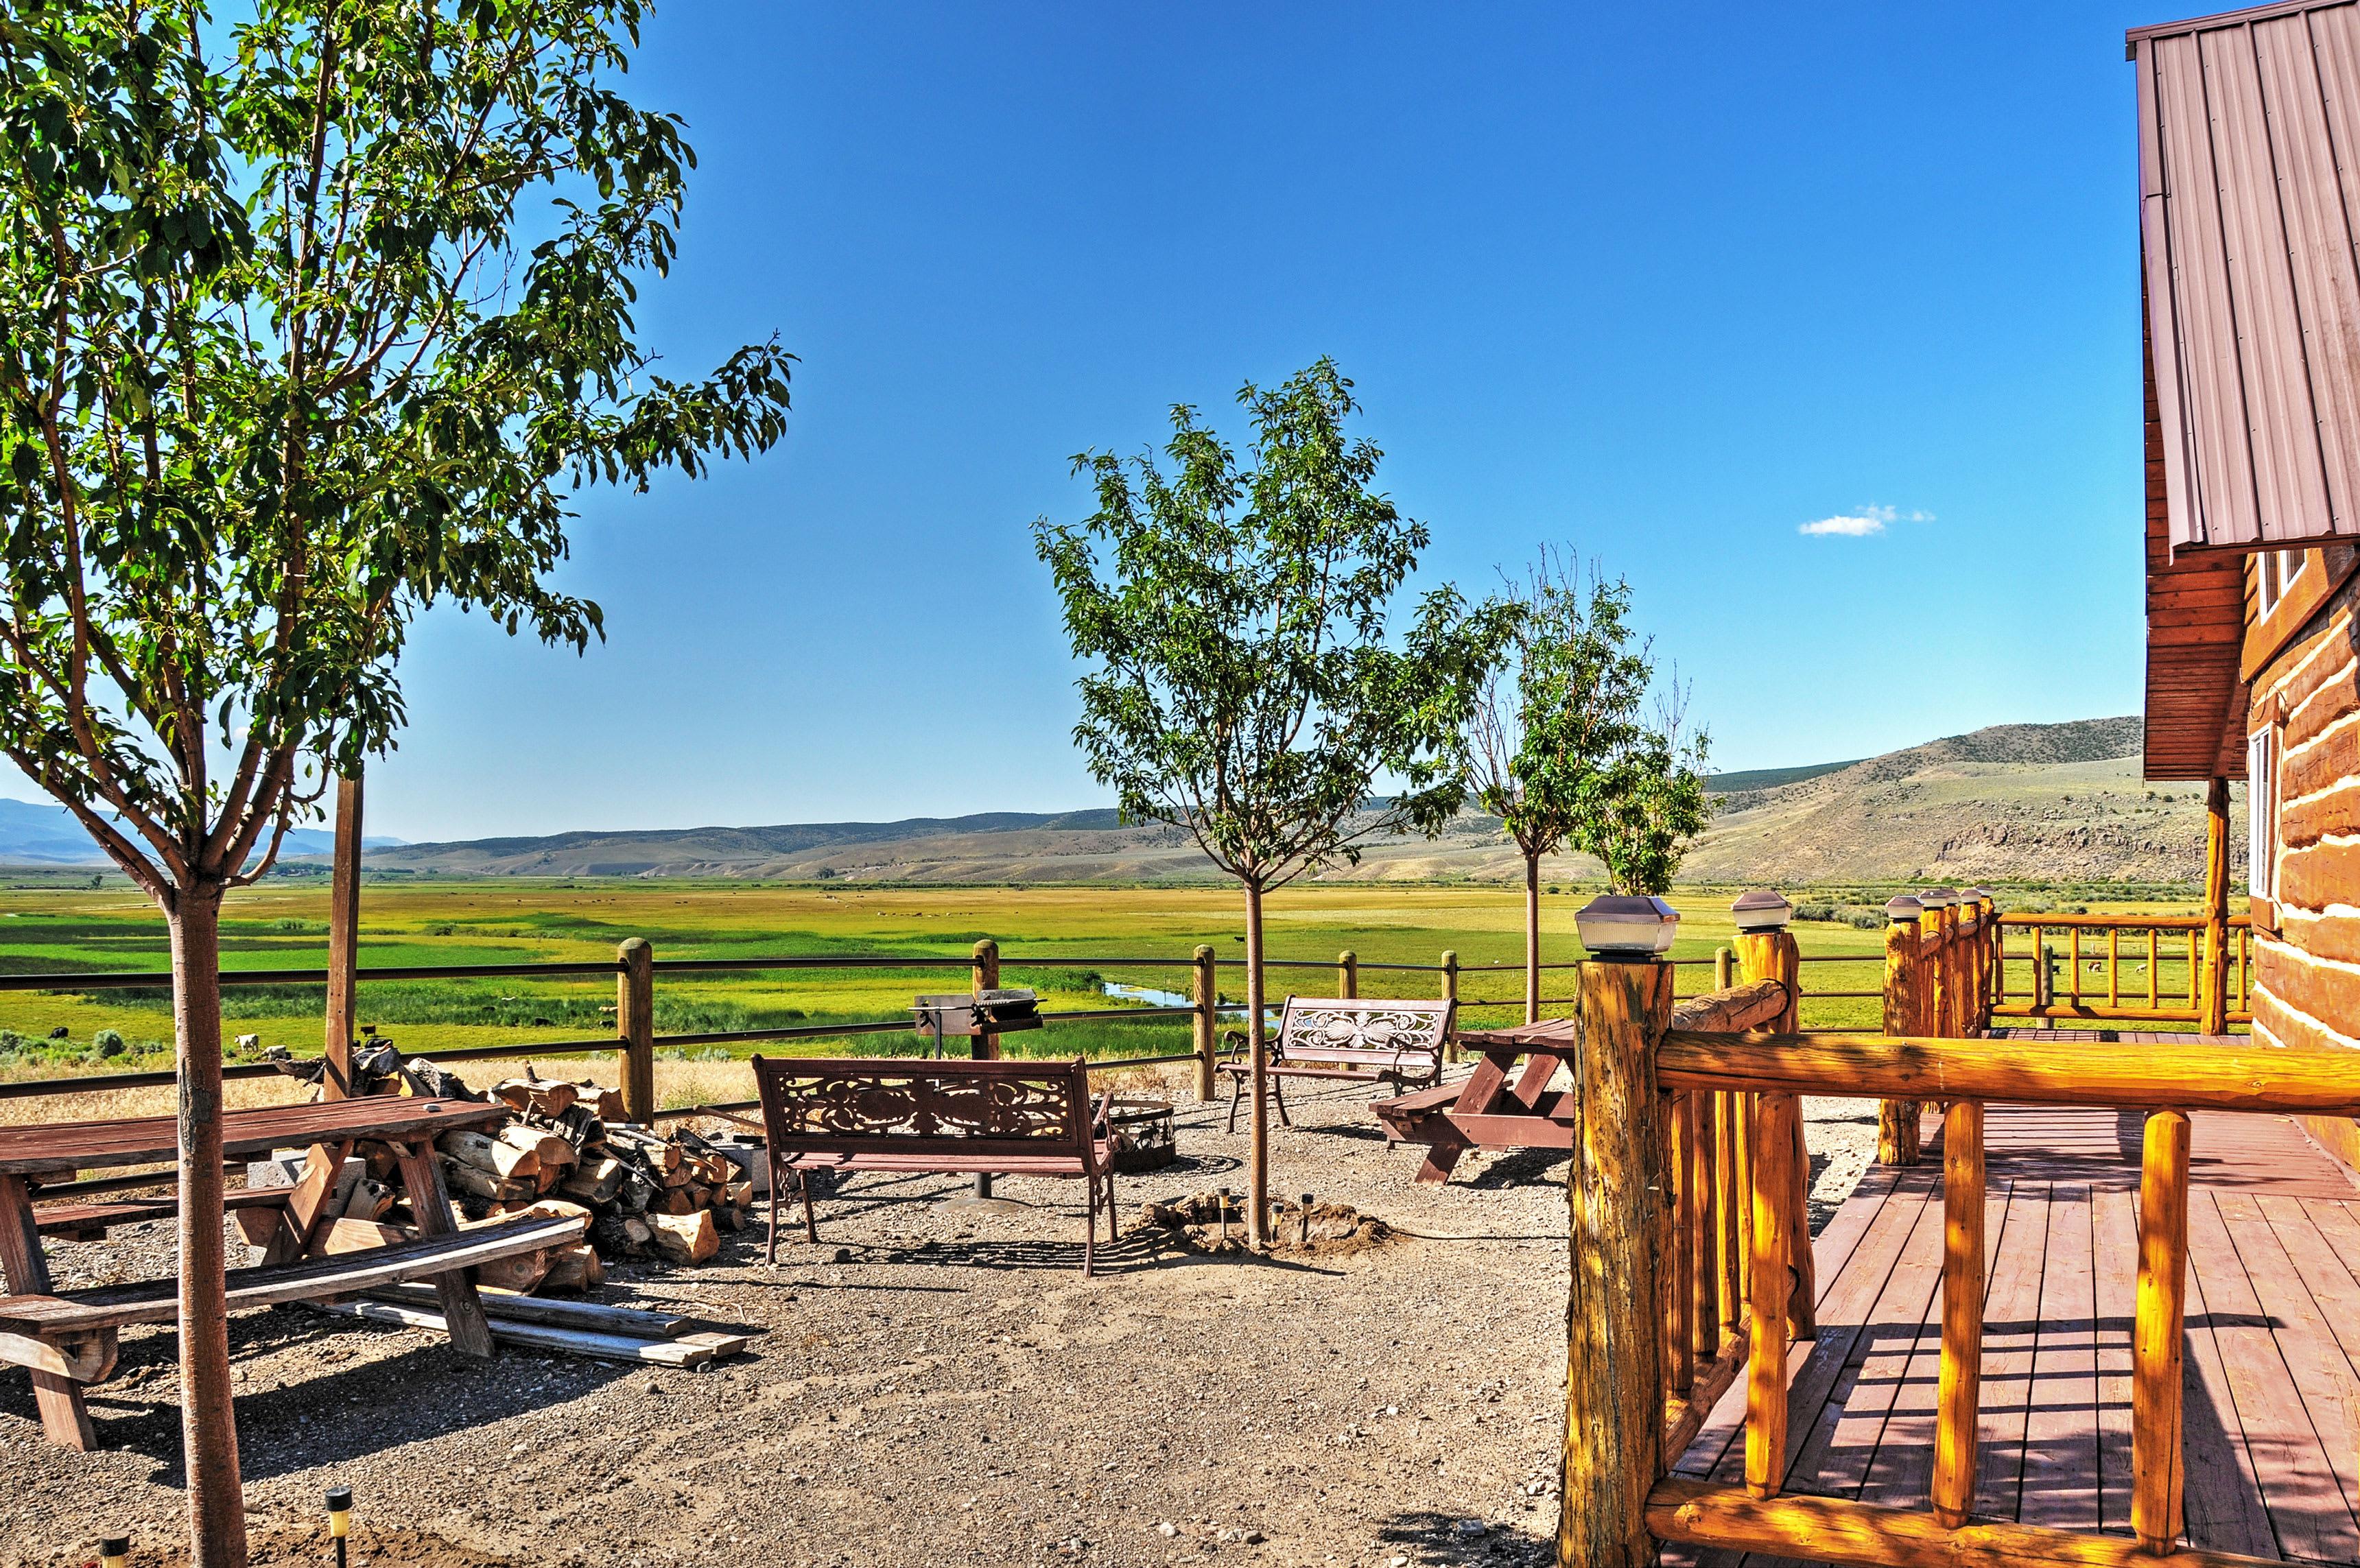 Enjoy marvelous views of the extensive plains and stunning mountain vistas.